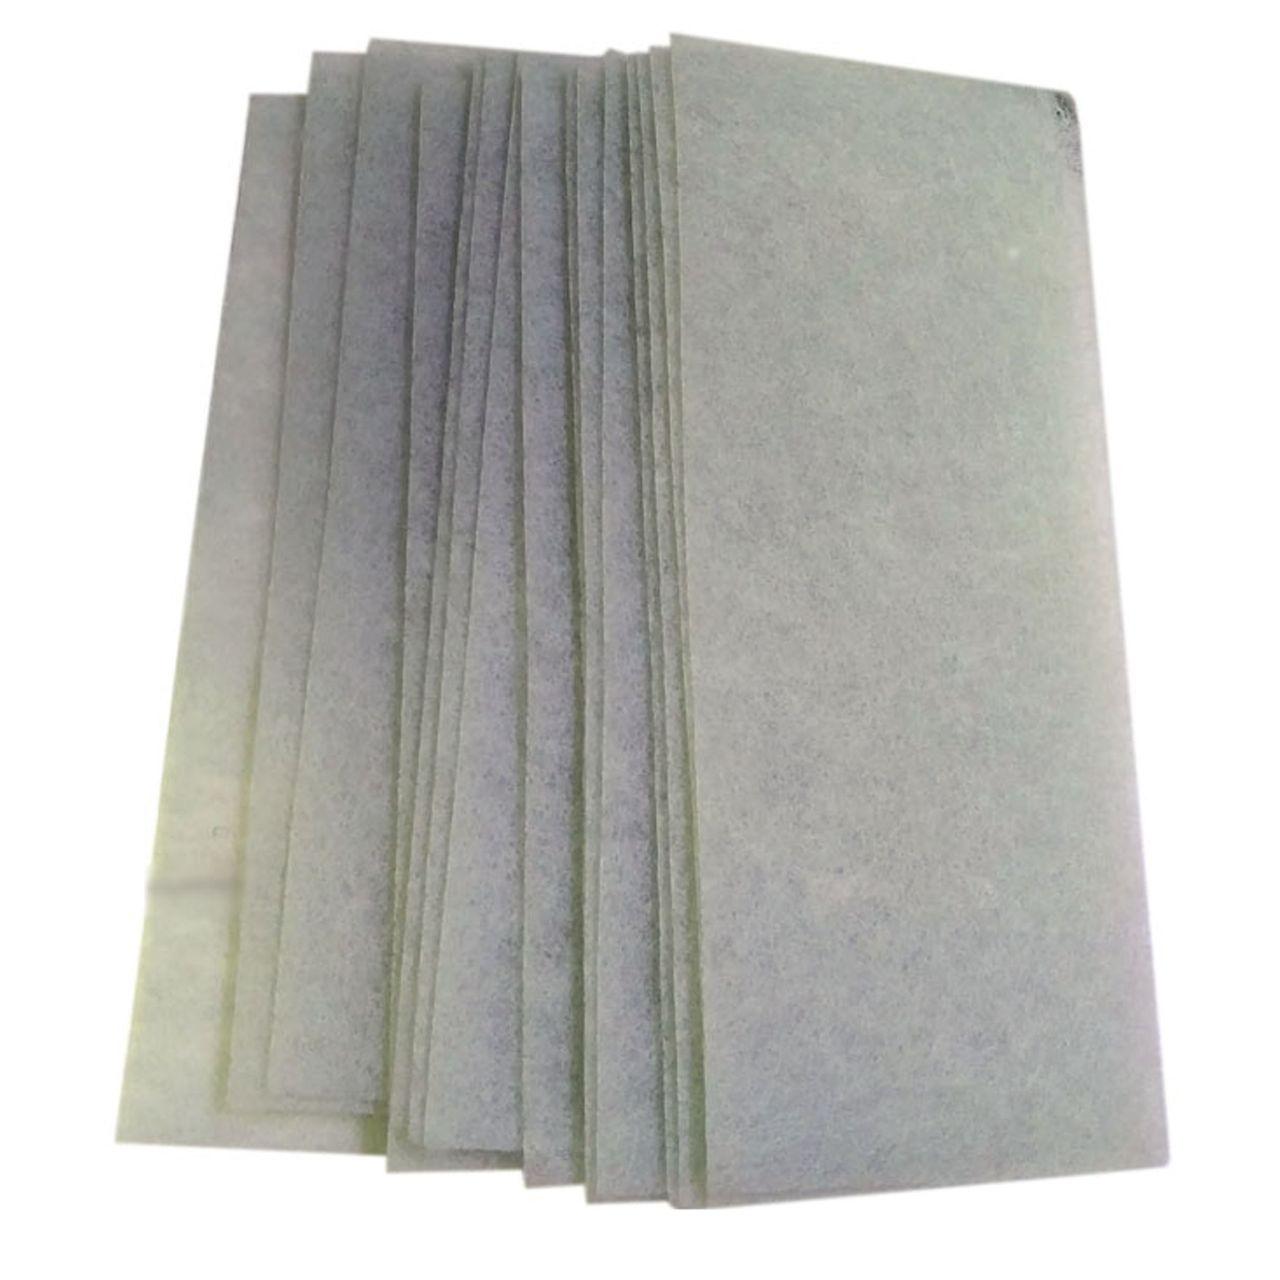 پد فیلتر آکواریوم مدل AS004 بسته 15 عددی